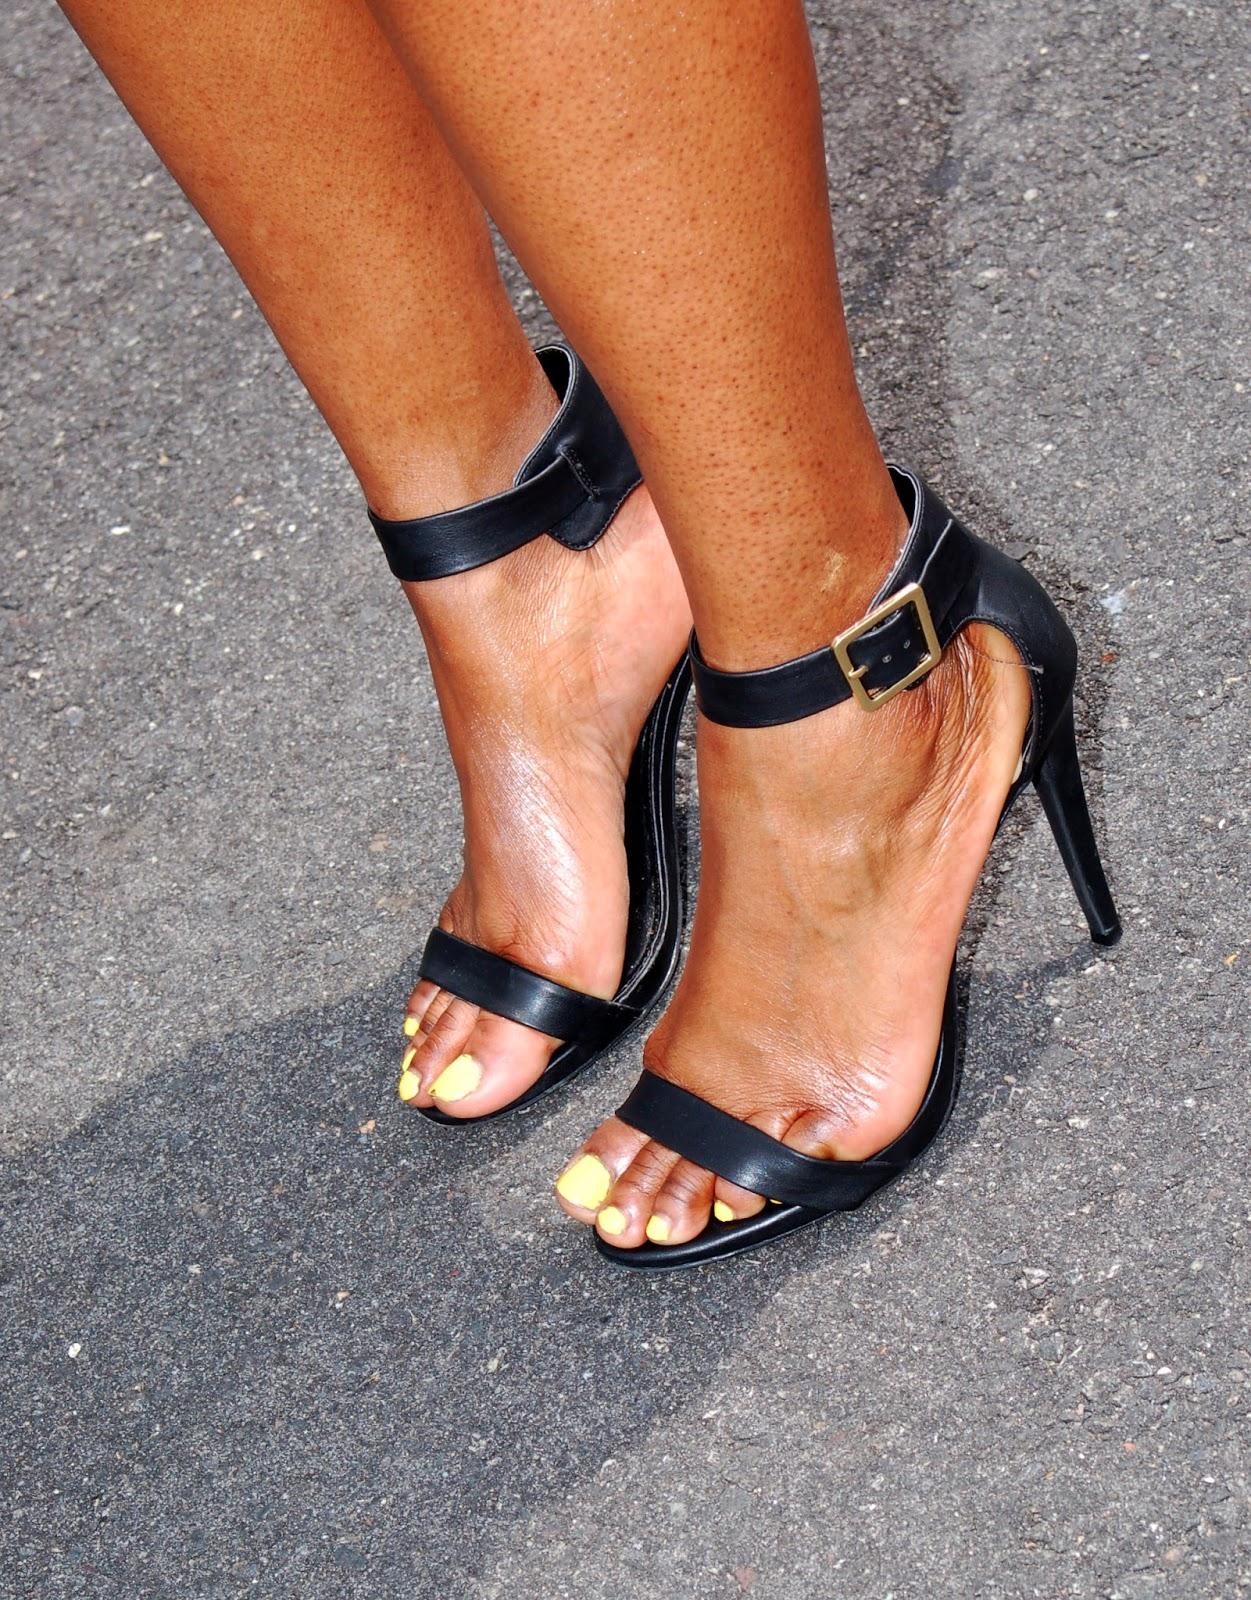 http://www.target.com/p/women-s-mossimo-shari-ankle-strap-heels-assorted-colors/-/A-14875195#prodSlot=medium_1_44